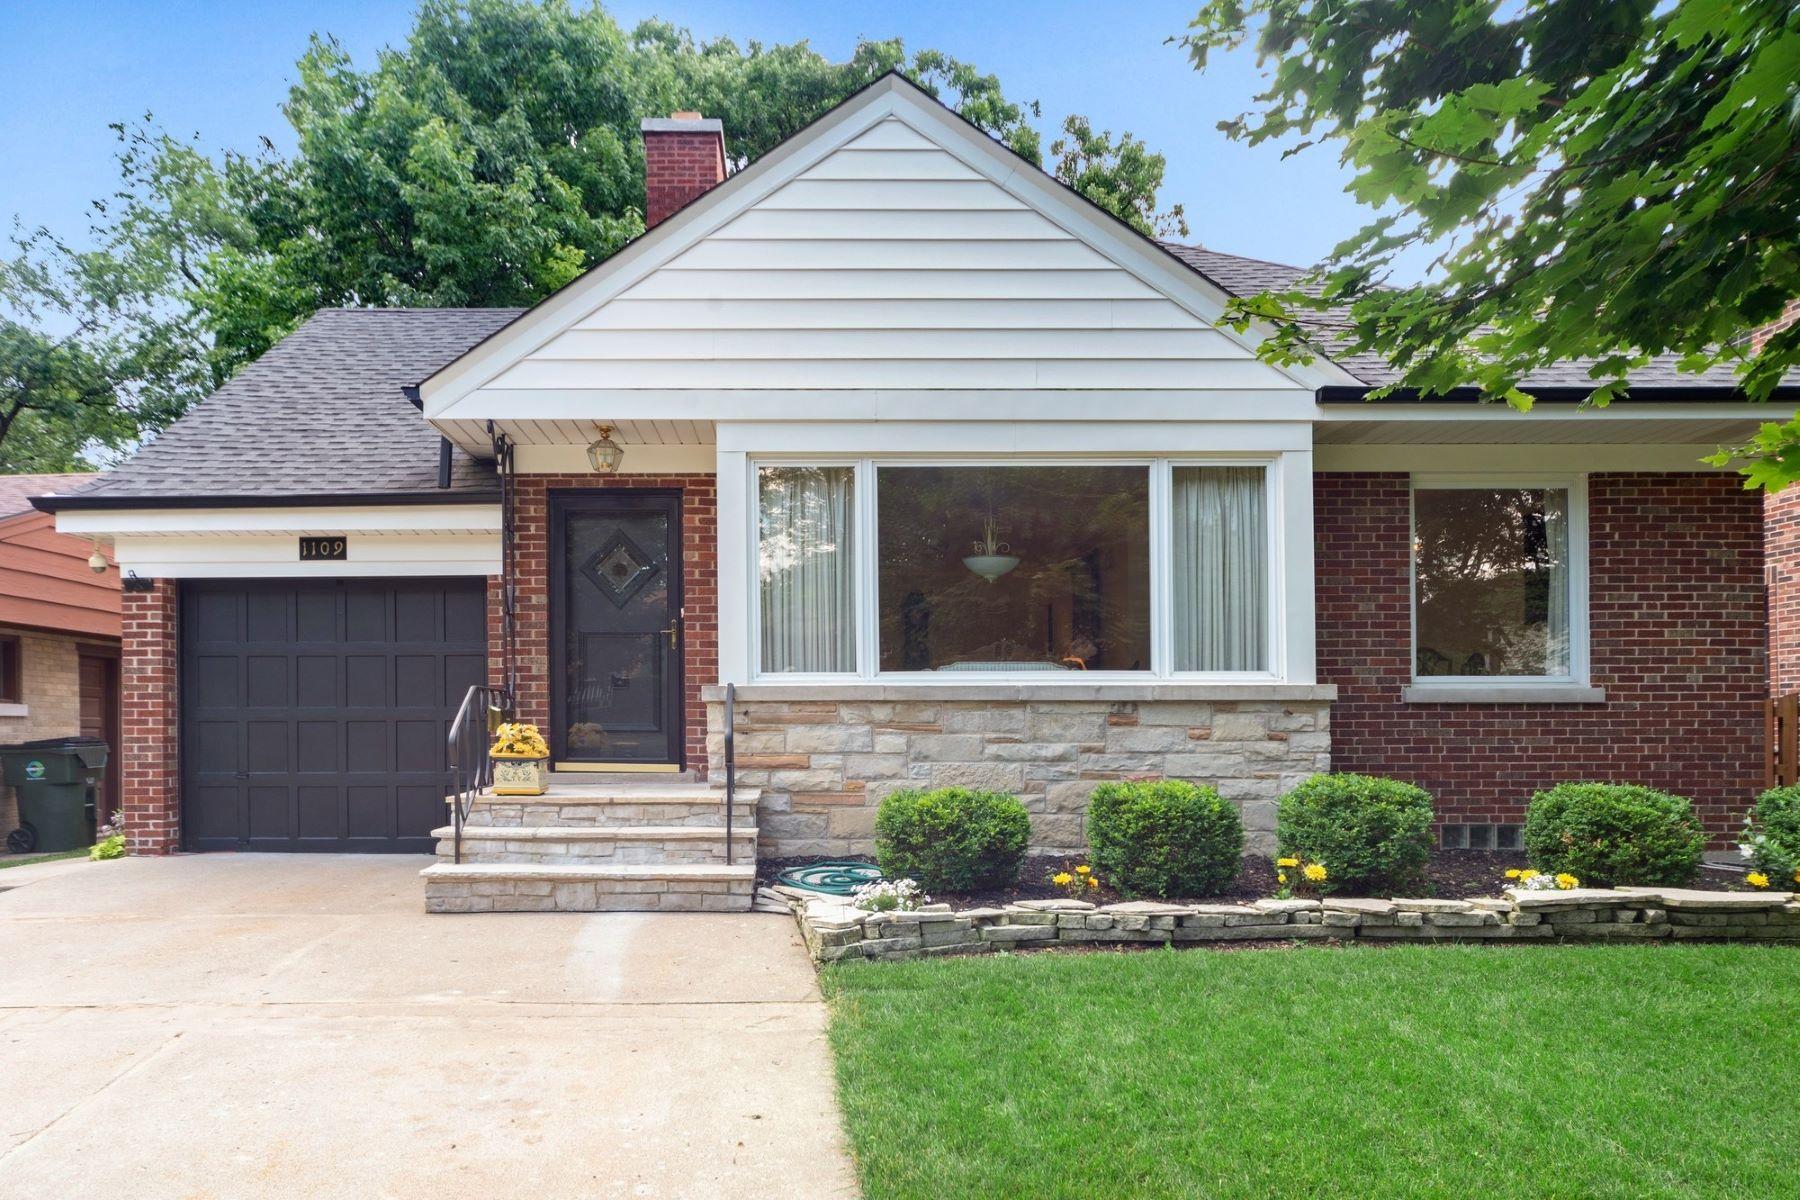 Single Family Homes for Active at Gorgeous Park Ridge Home 1109 S Aldine Avenue Park Ridge, Illinois 60068 United States